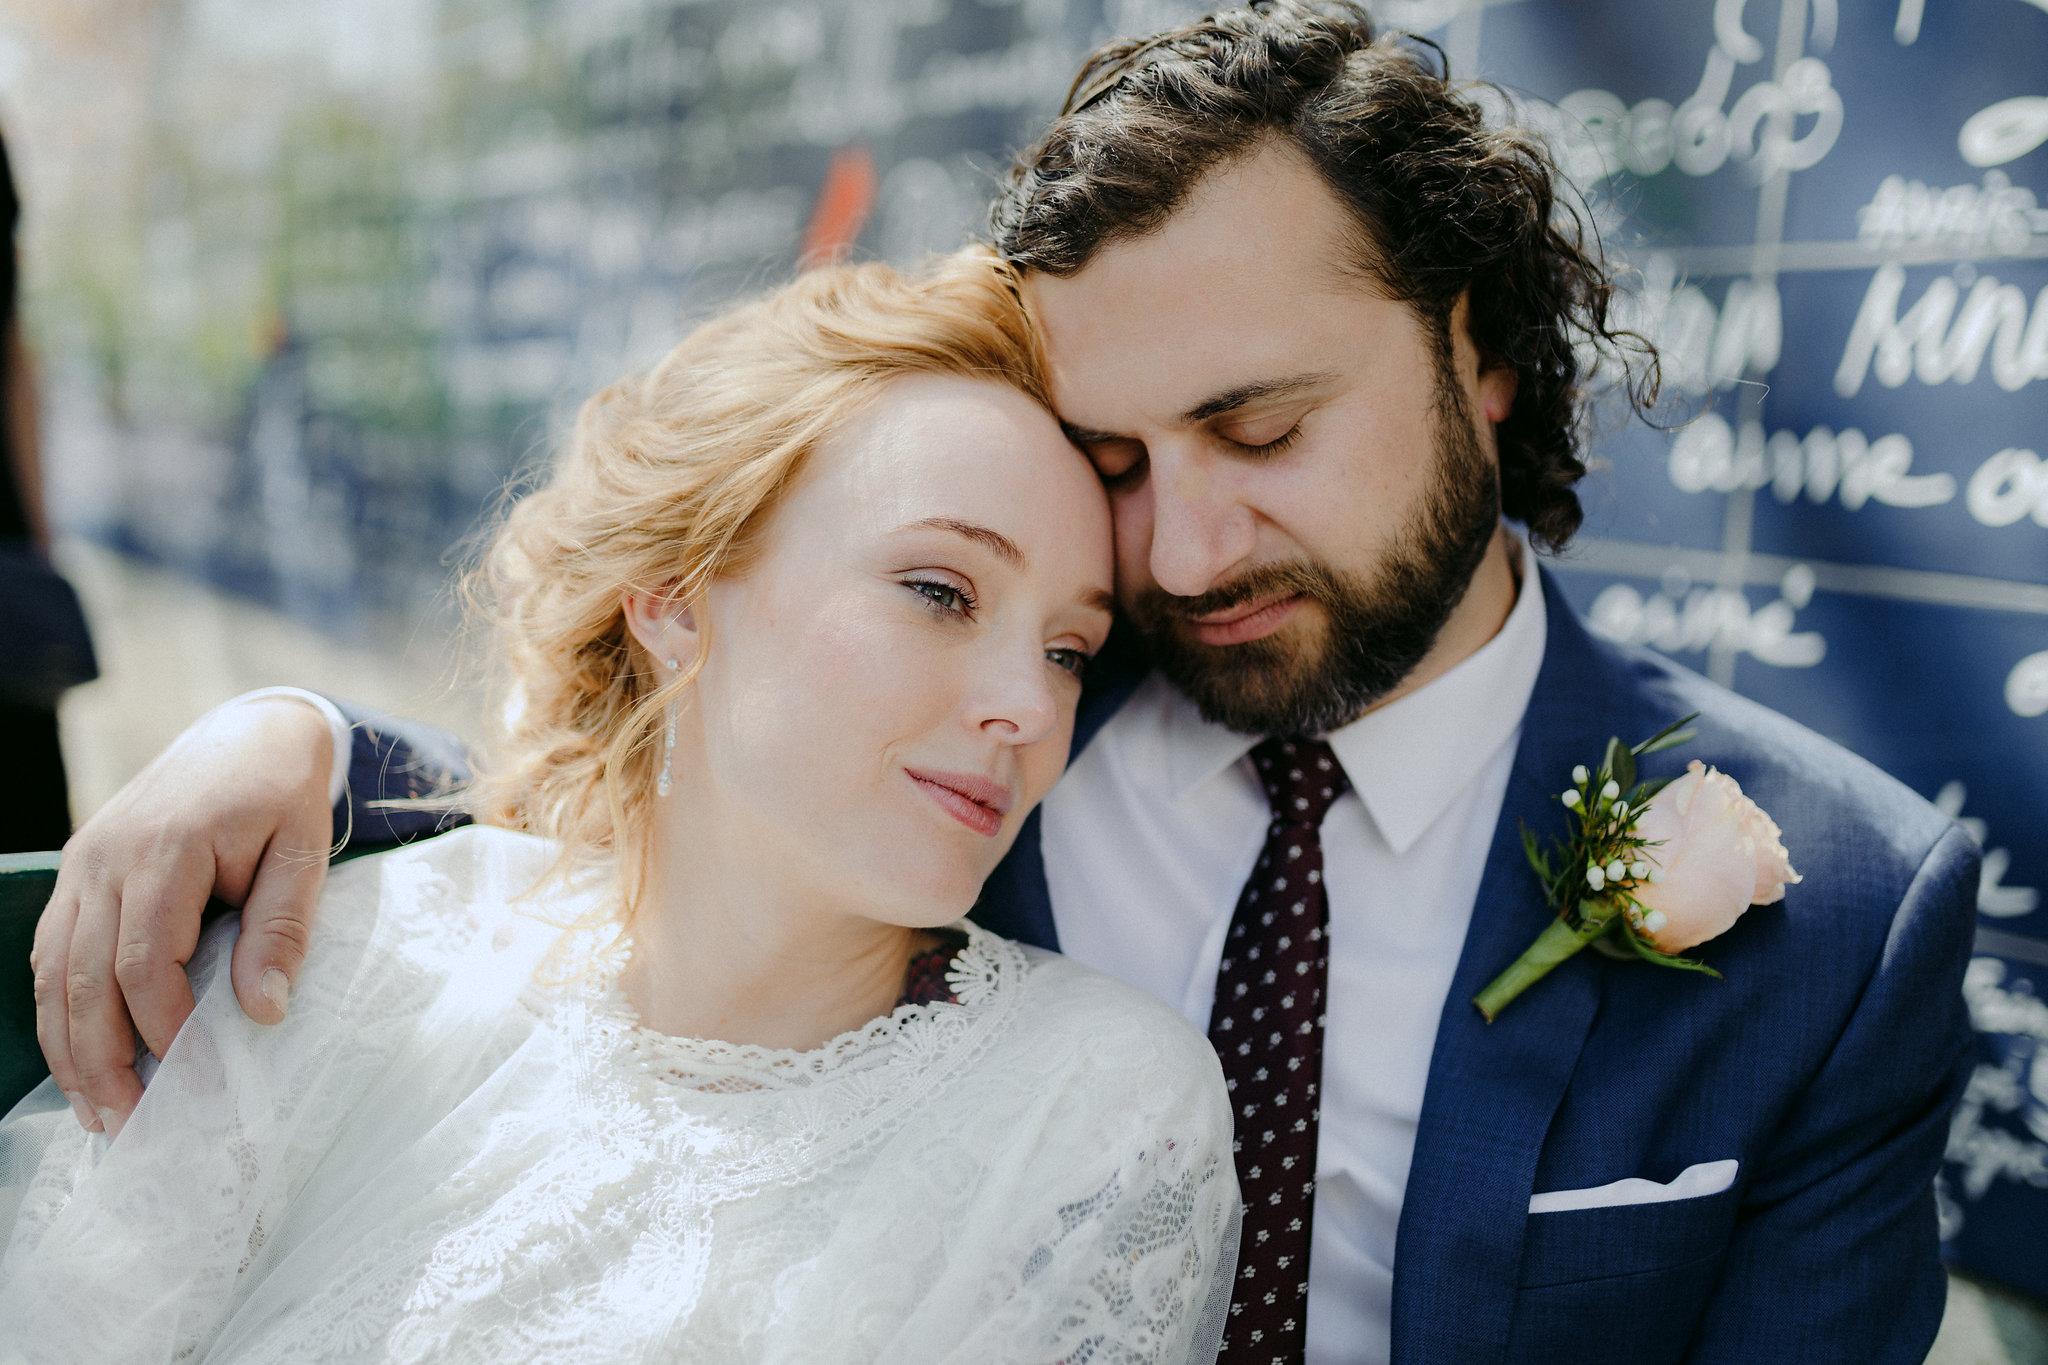 Paris_elopement_wedding_photographer-373.jpg